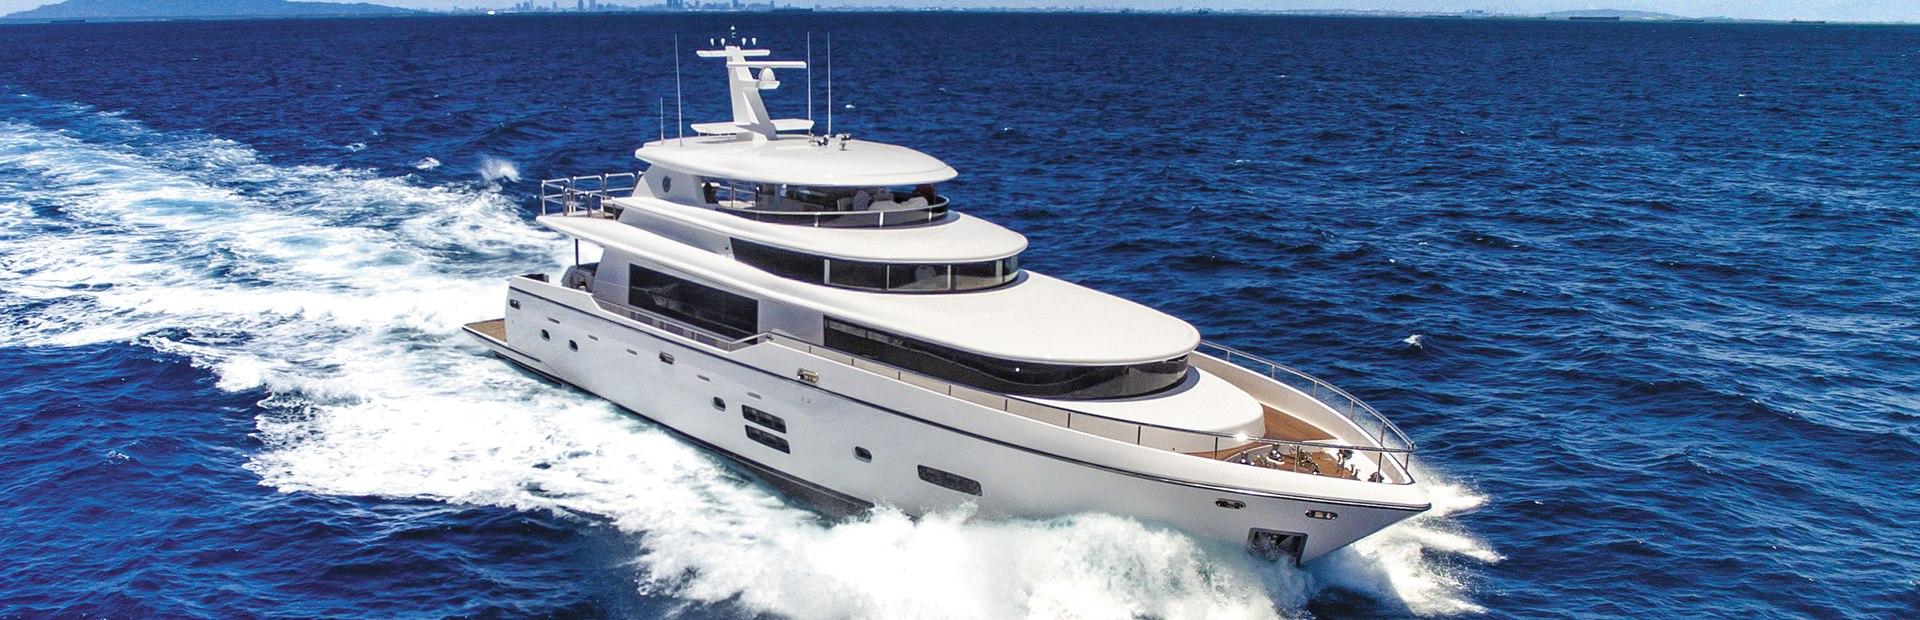 Johnson 93 Yacht Charter